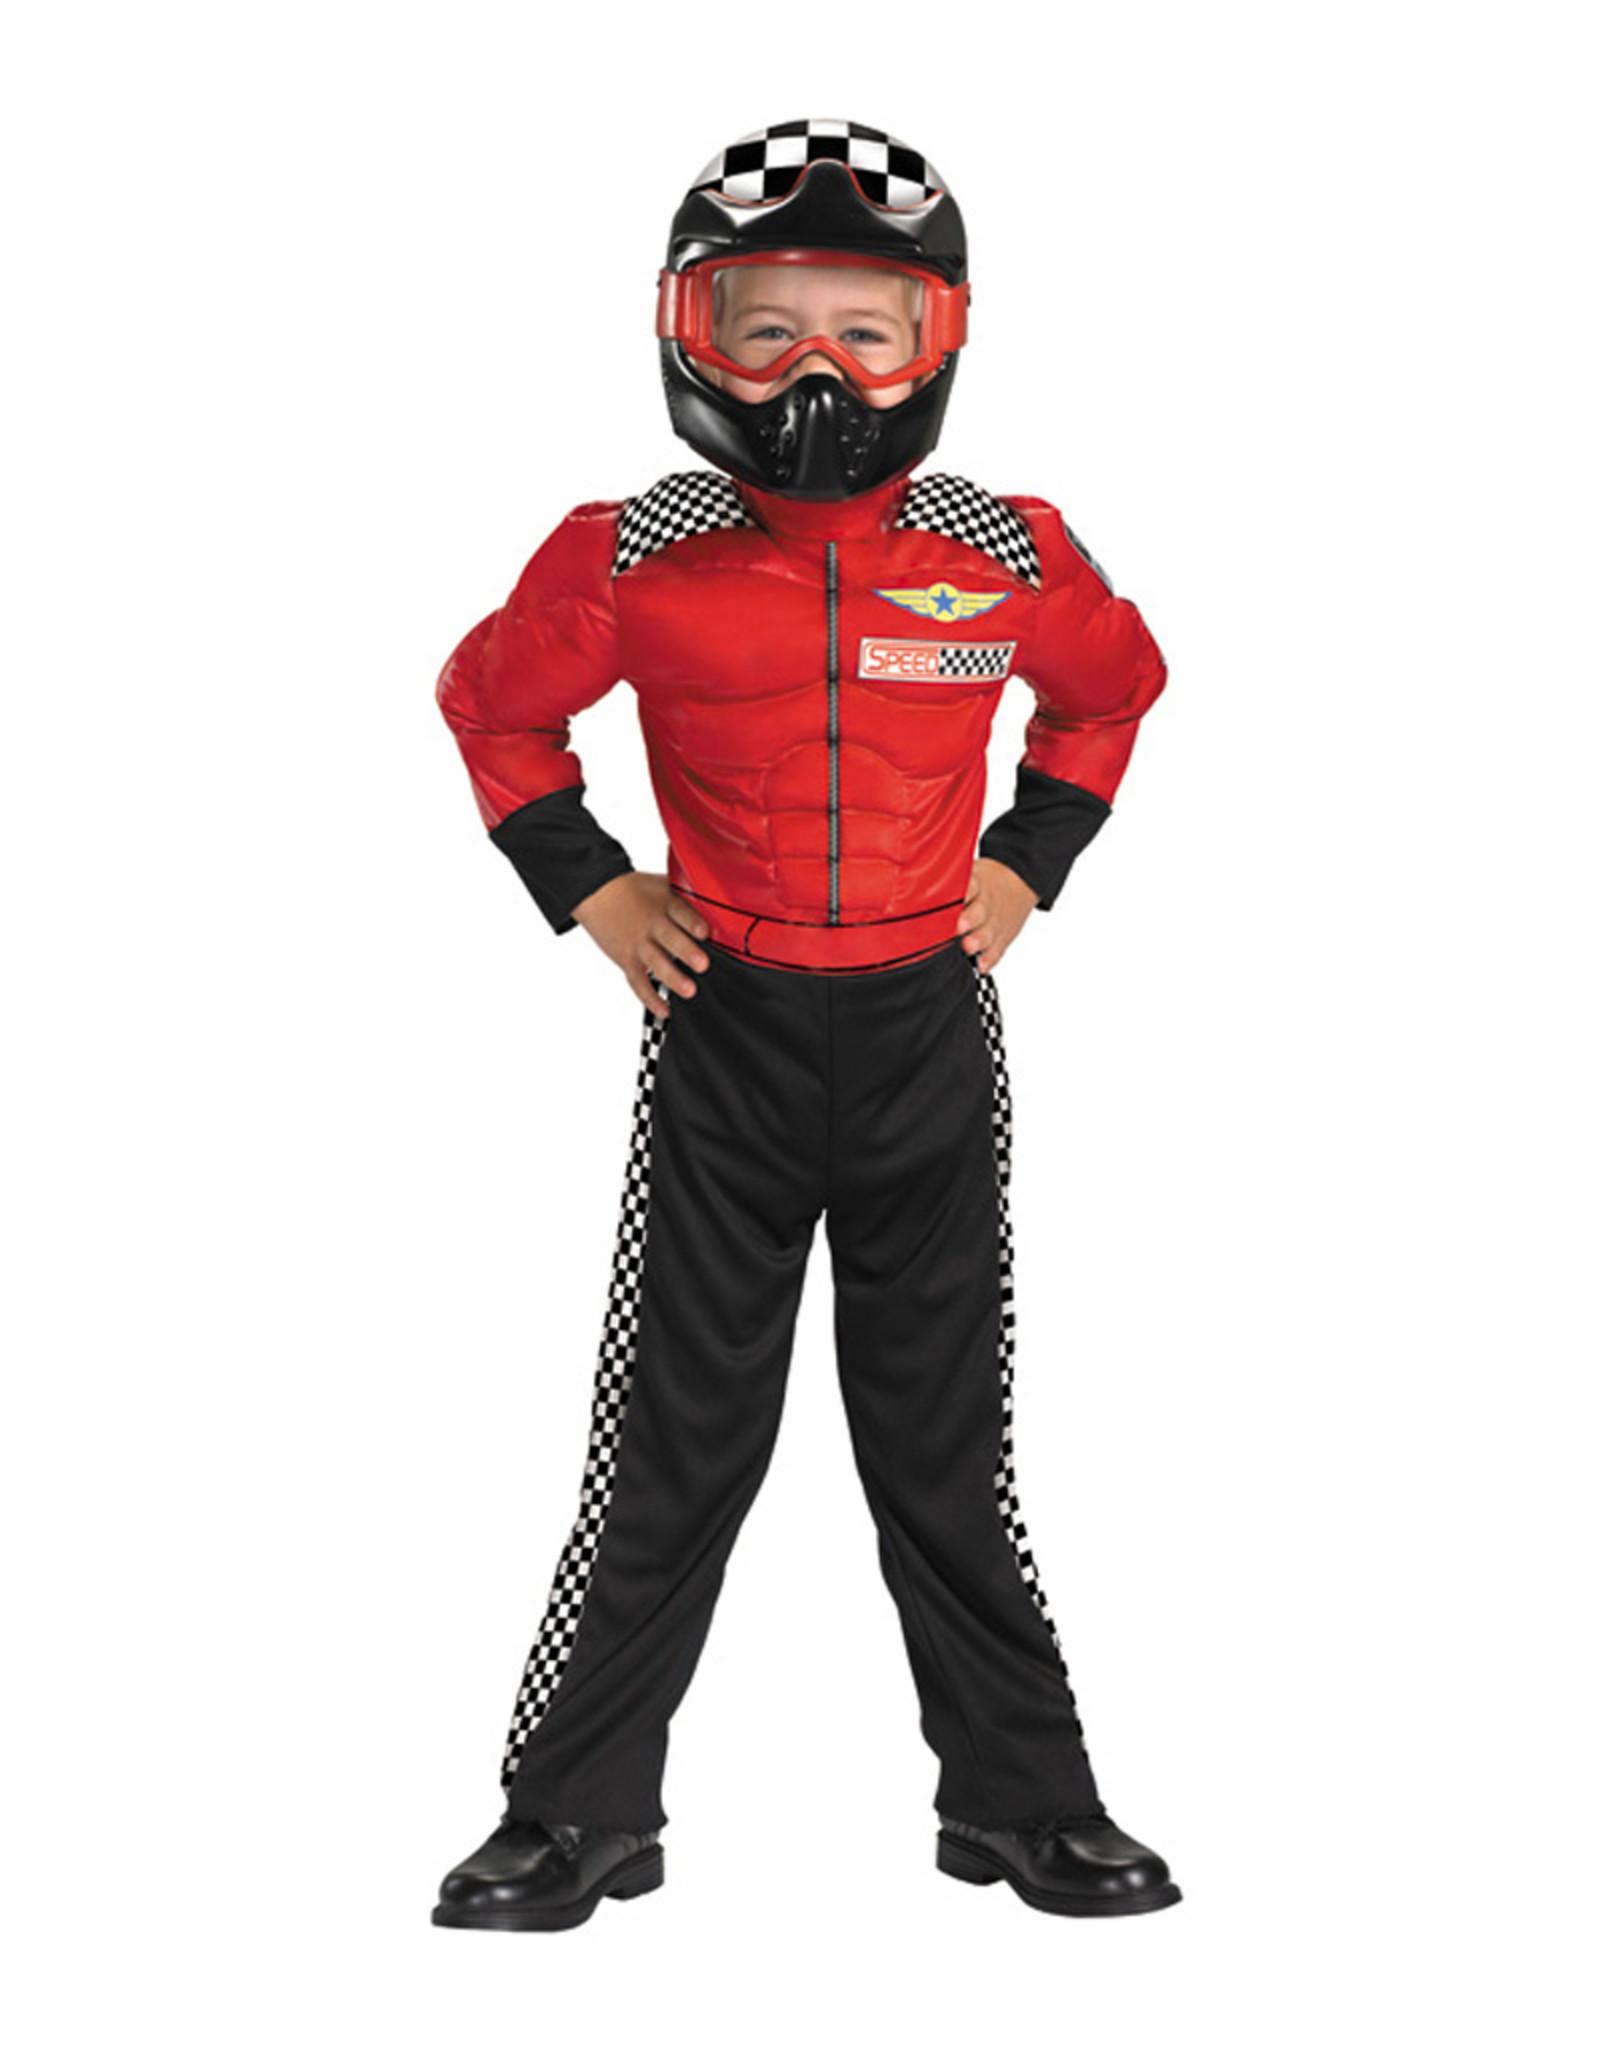 Turbo Racer Deluxe Costume - Toddler